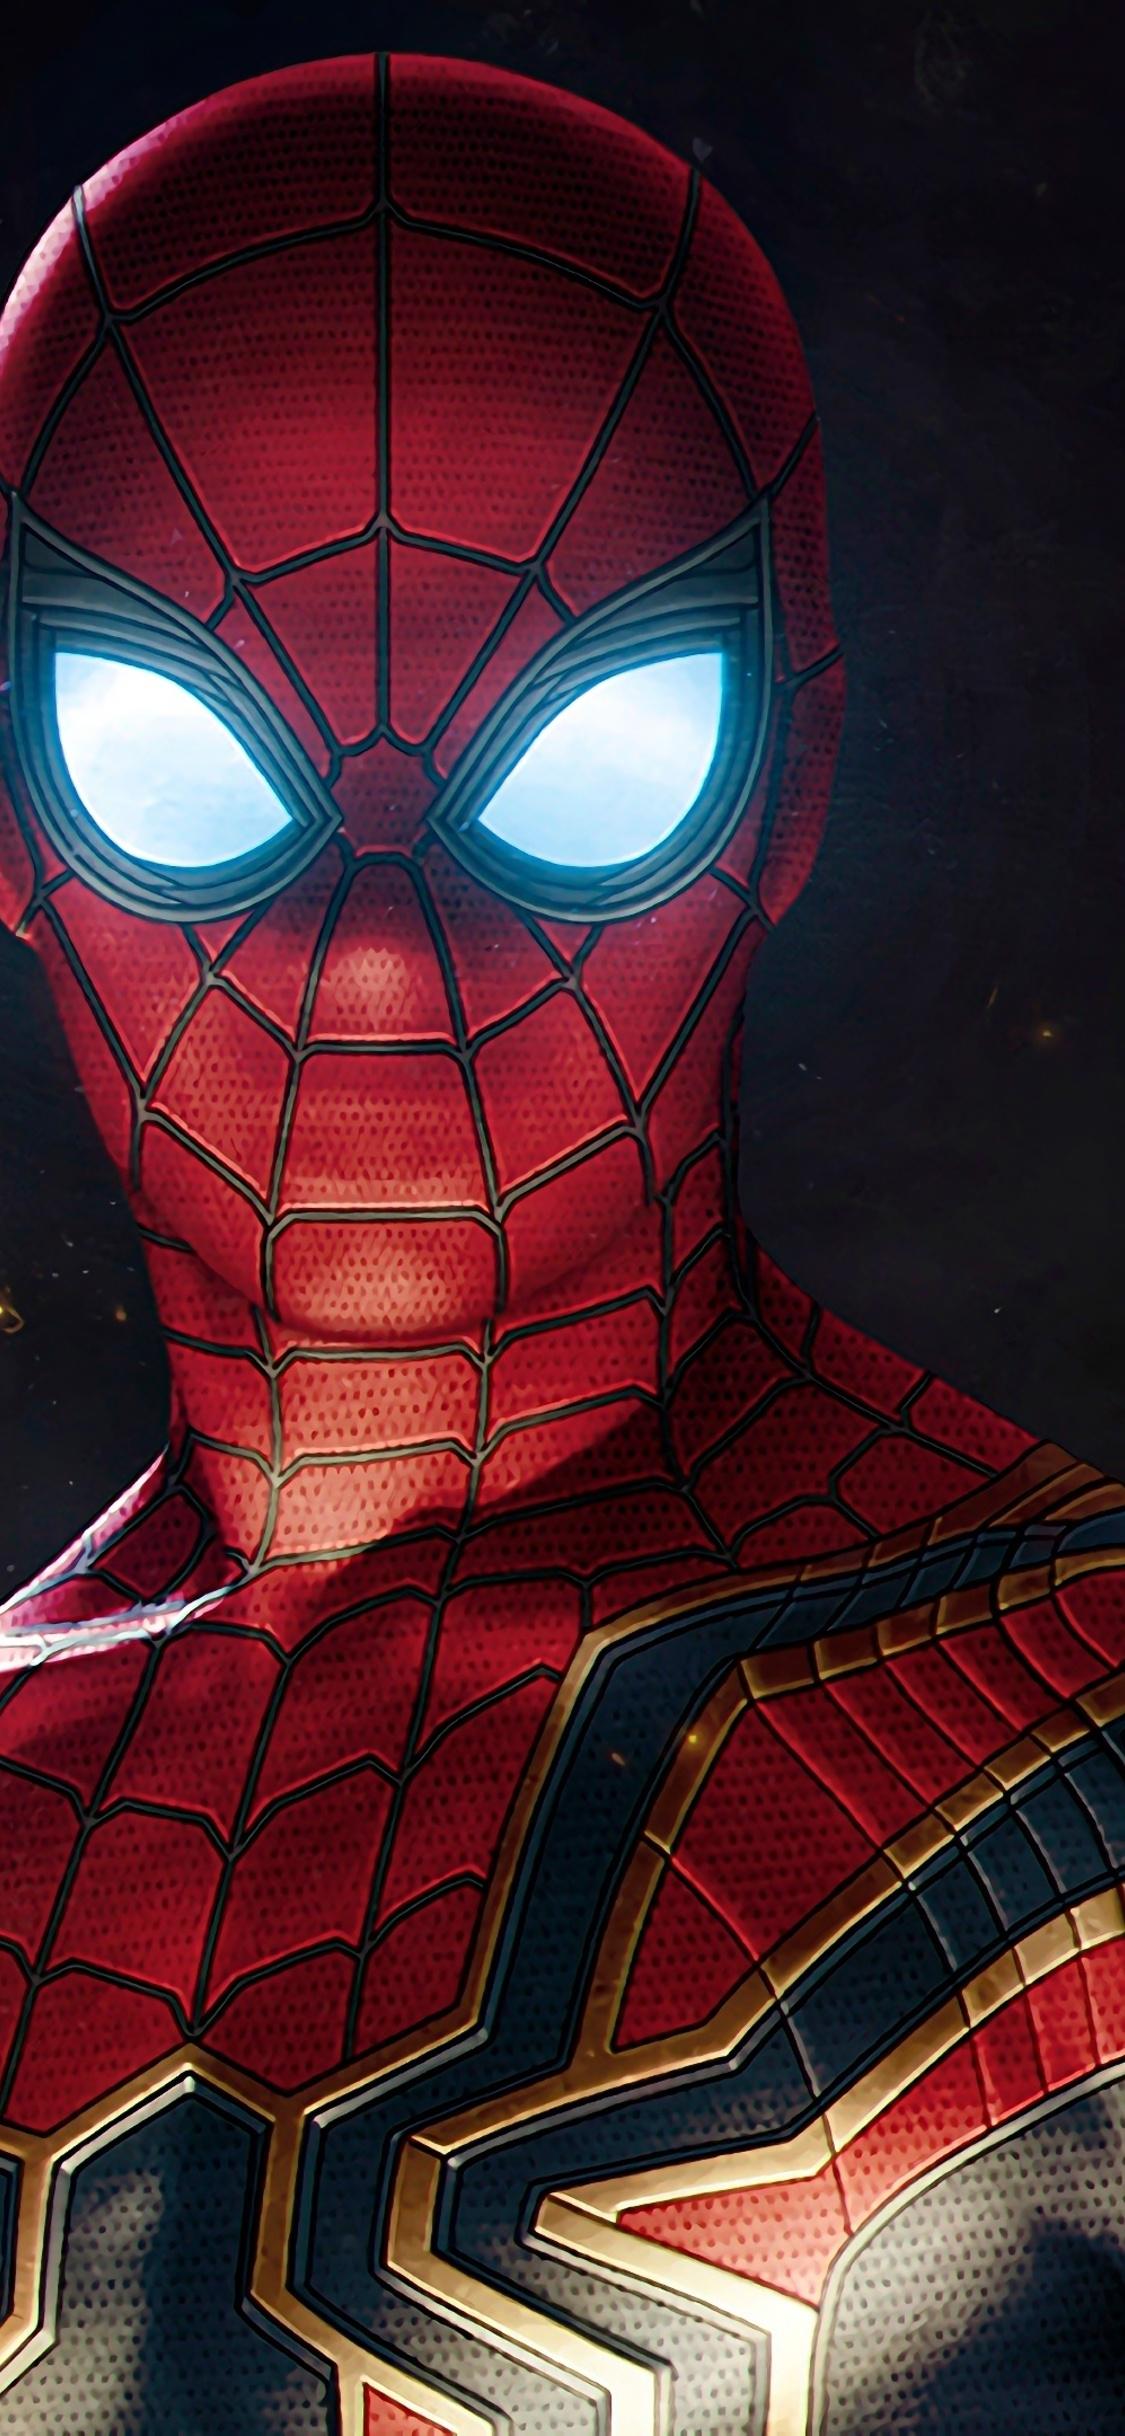 Download 63 Wallpaper Iphone Spiderman Hd HD Paling Keren